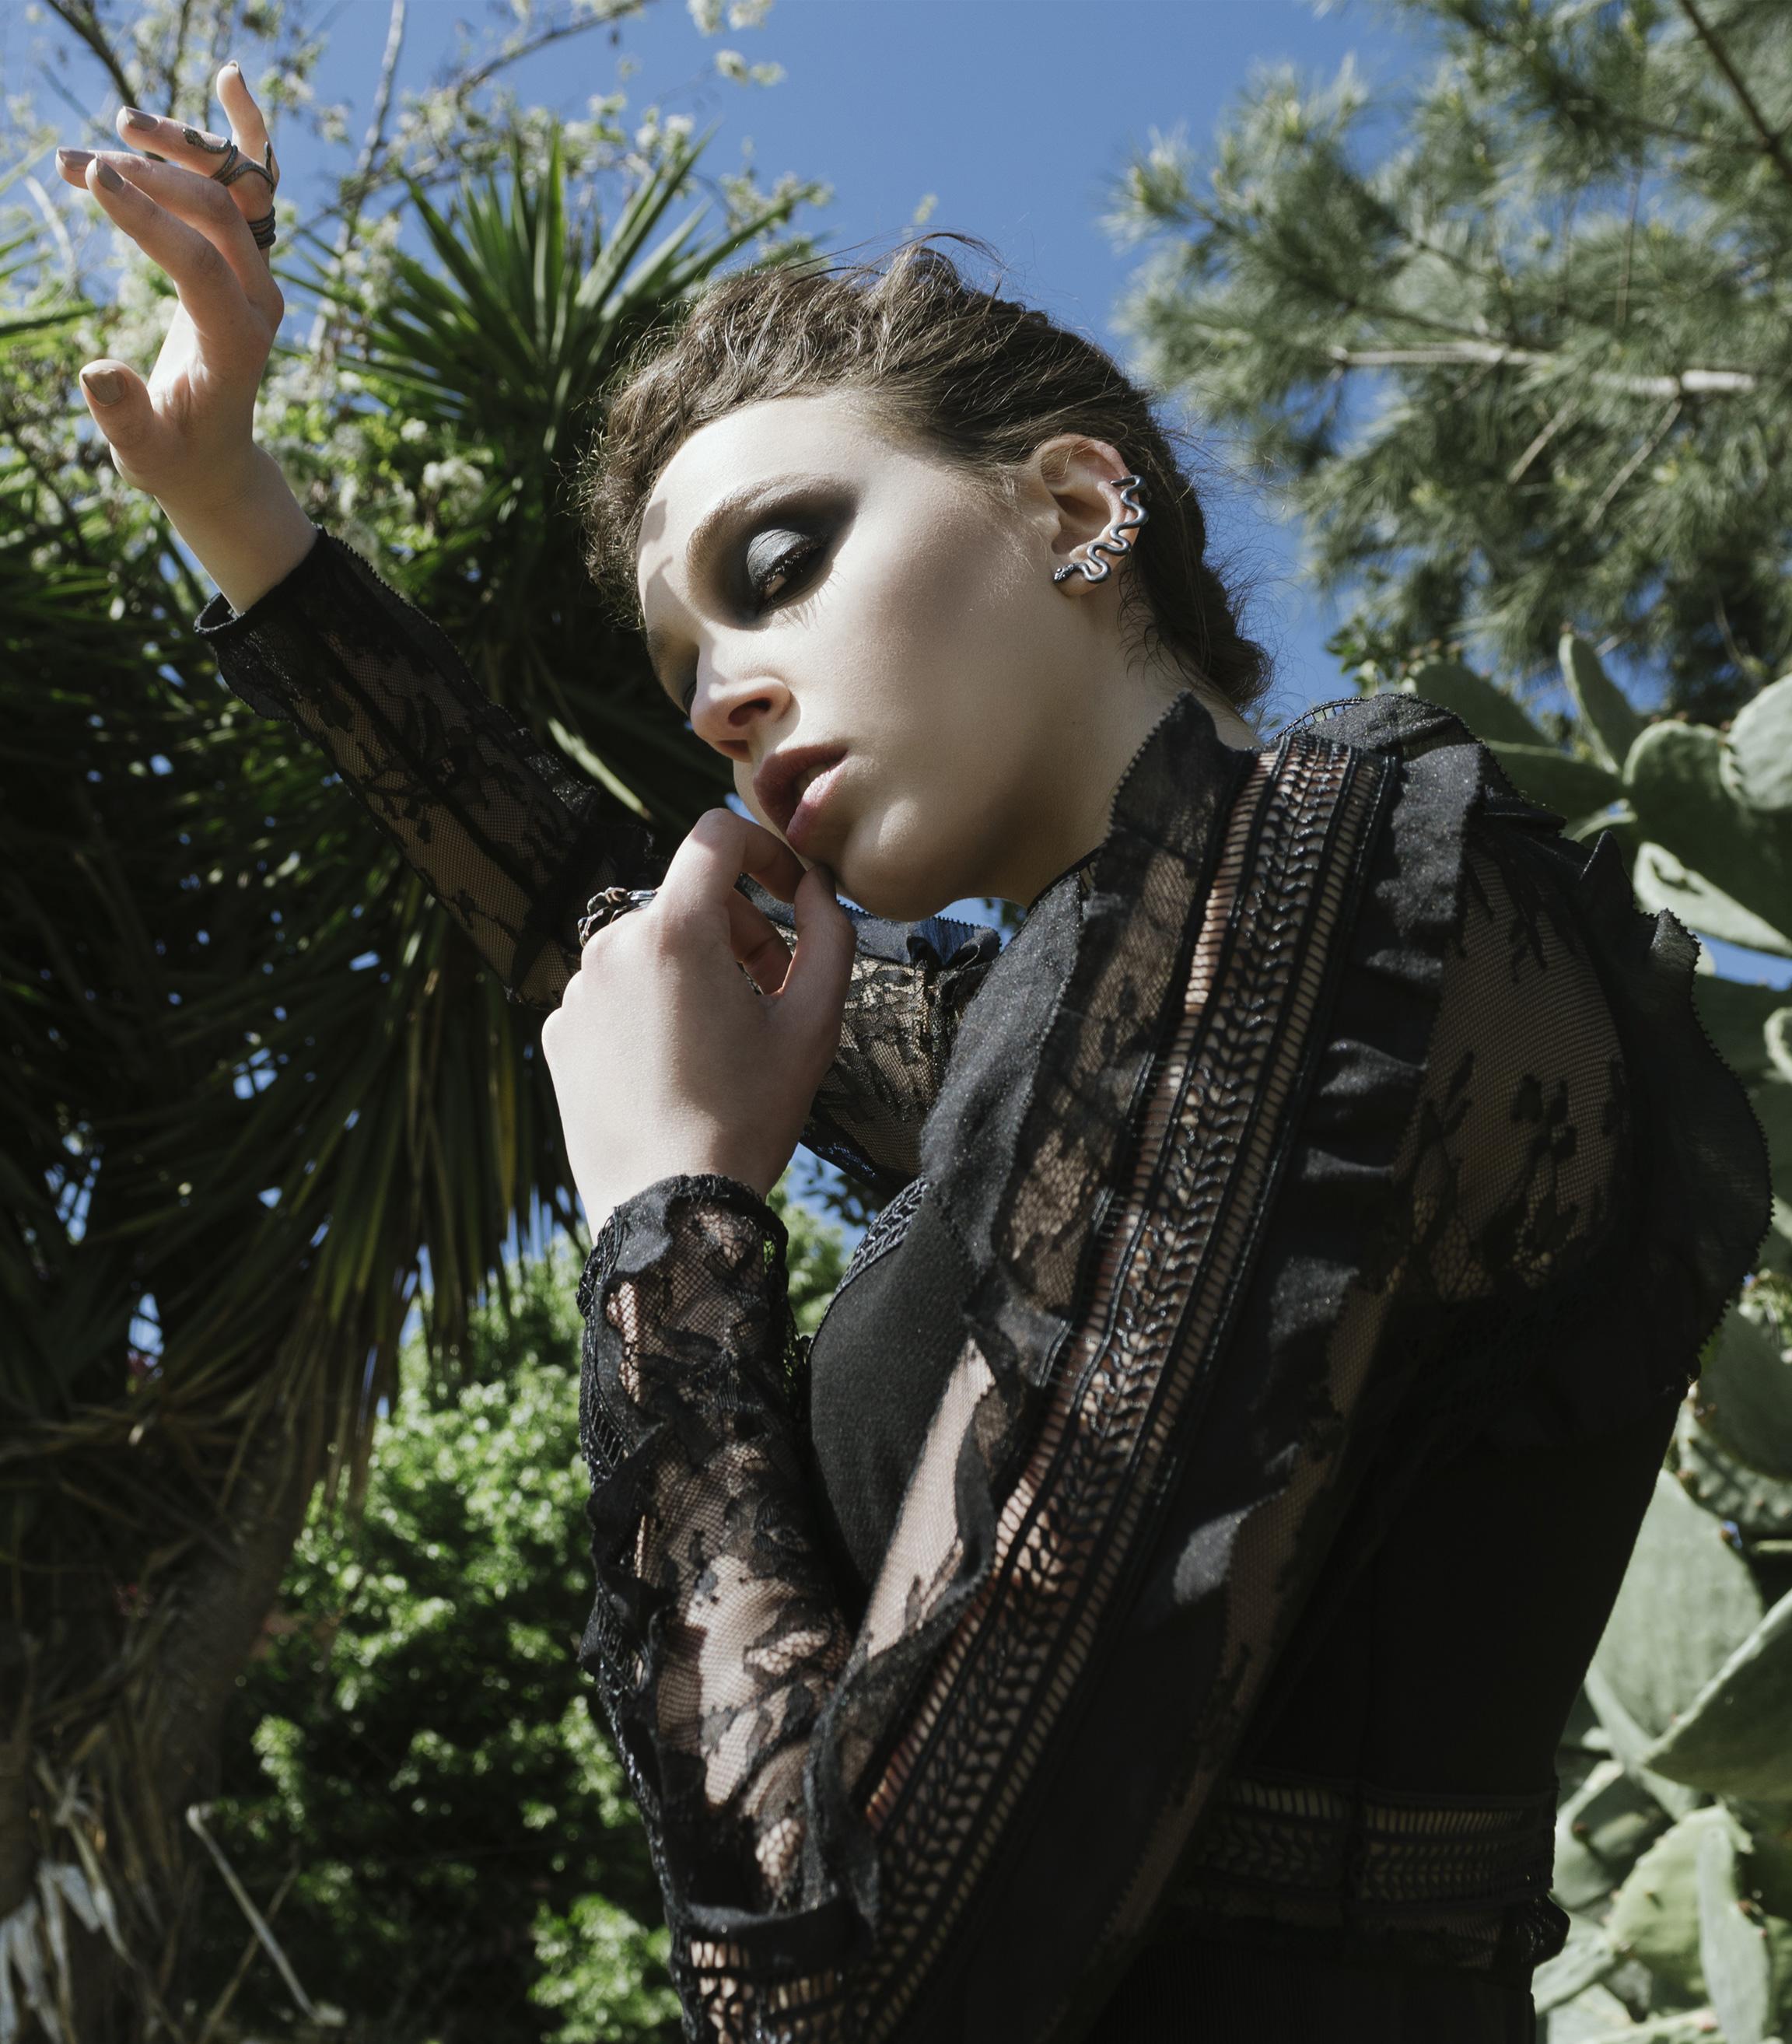 leam edit dark blossom editorial faith connexion valentino celine gown long black dress womenswear